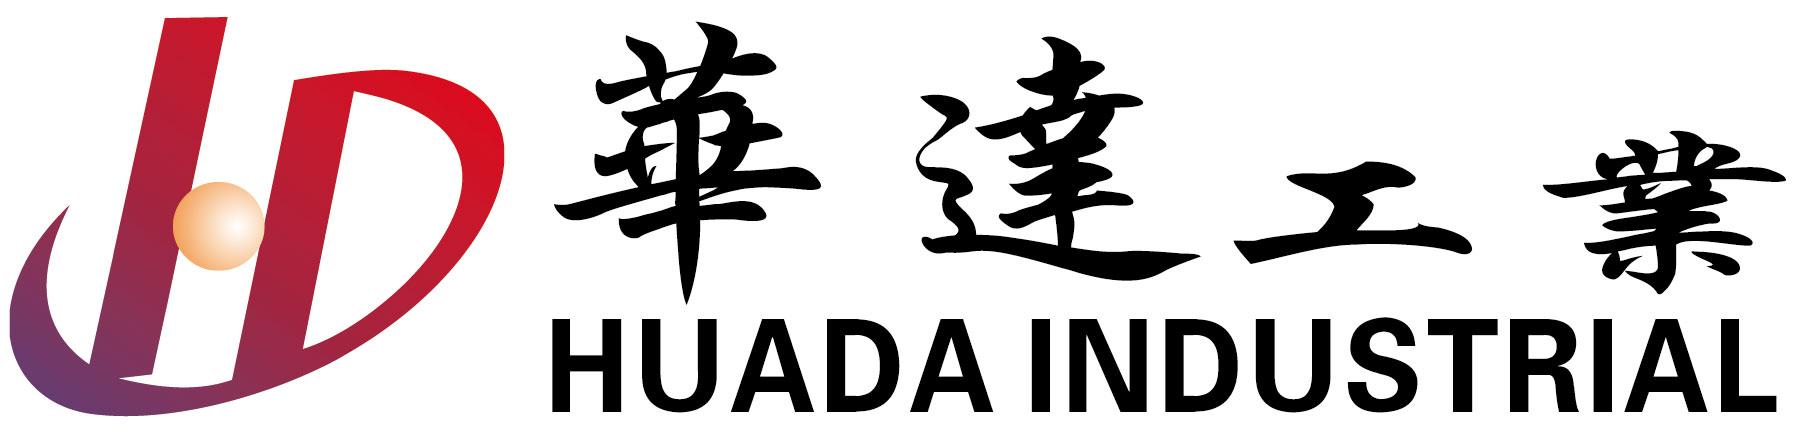 Huada Industrial Equipment Co., Ltd.